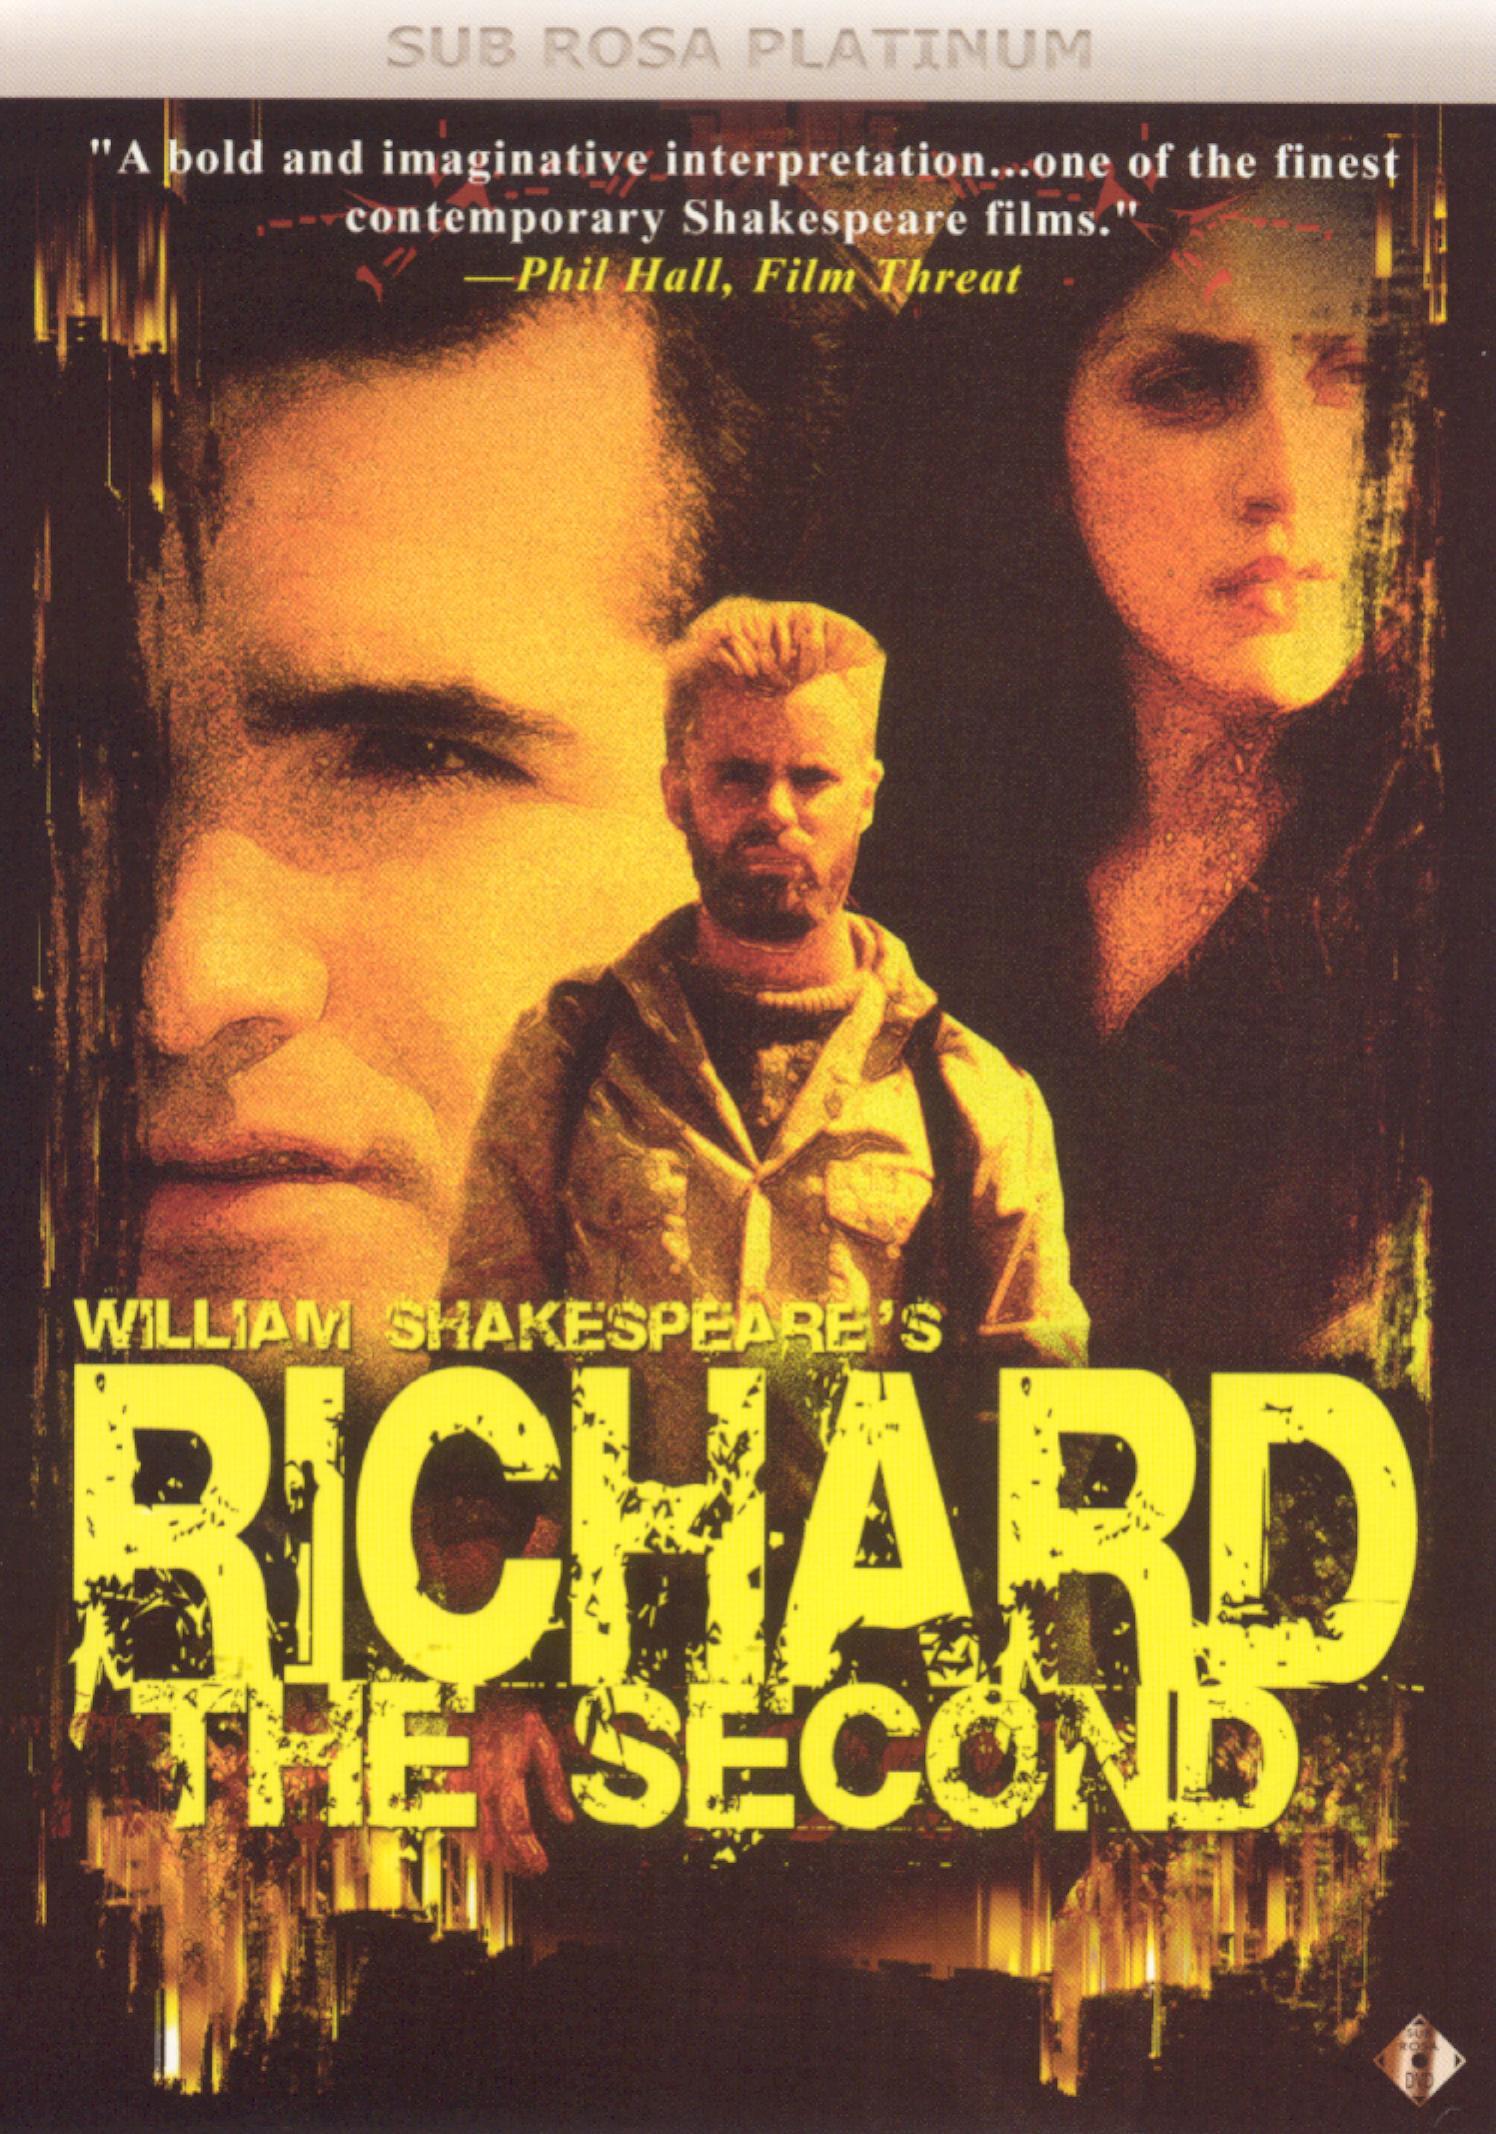 William Shakespeare's Richard the Second